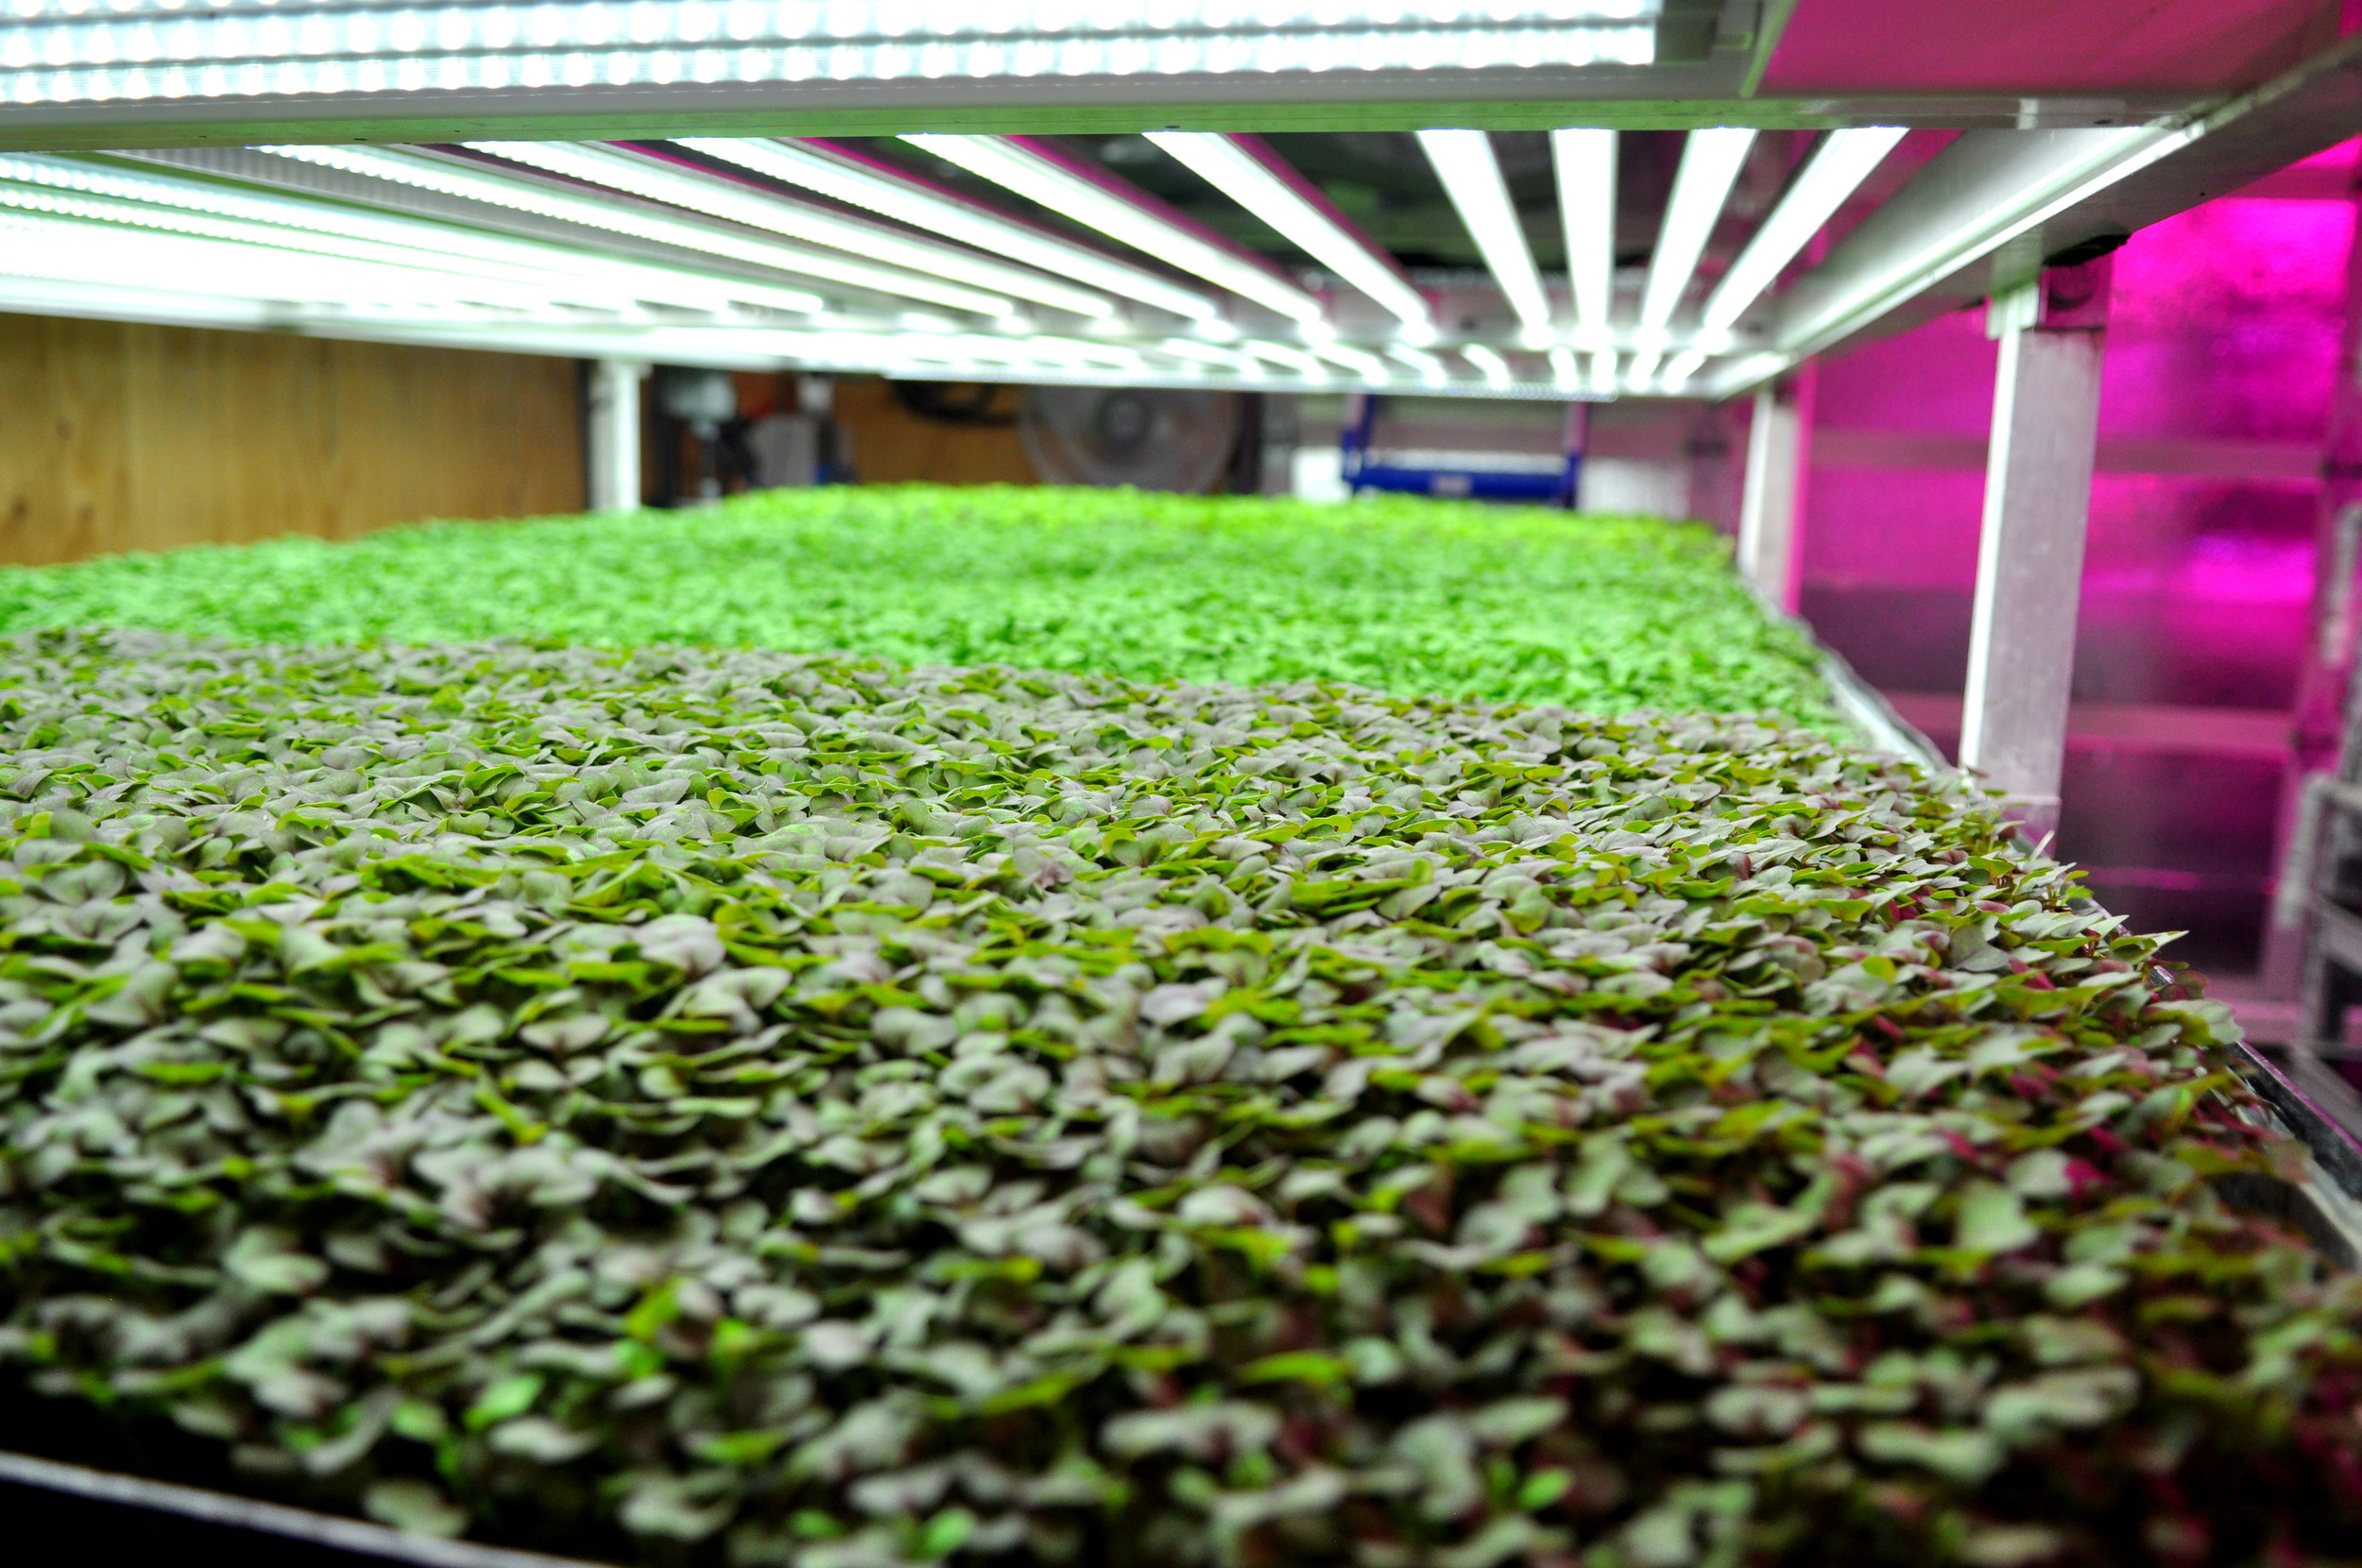 The vertical urban farm of Farmbox MIcrogreens. Copyright Zachary D. Lyons.